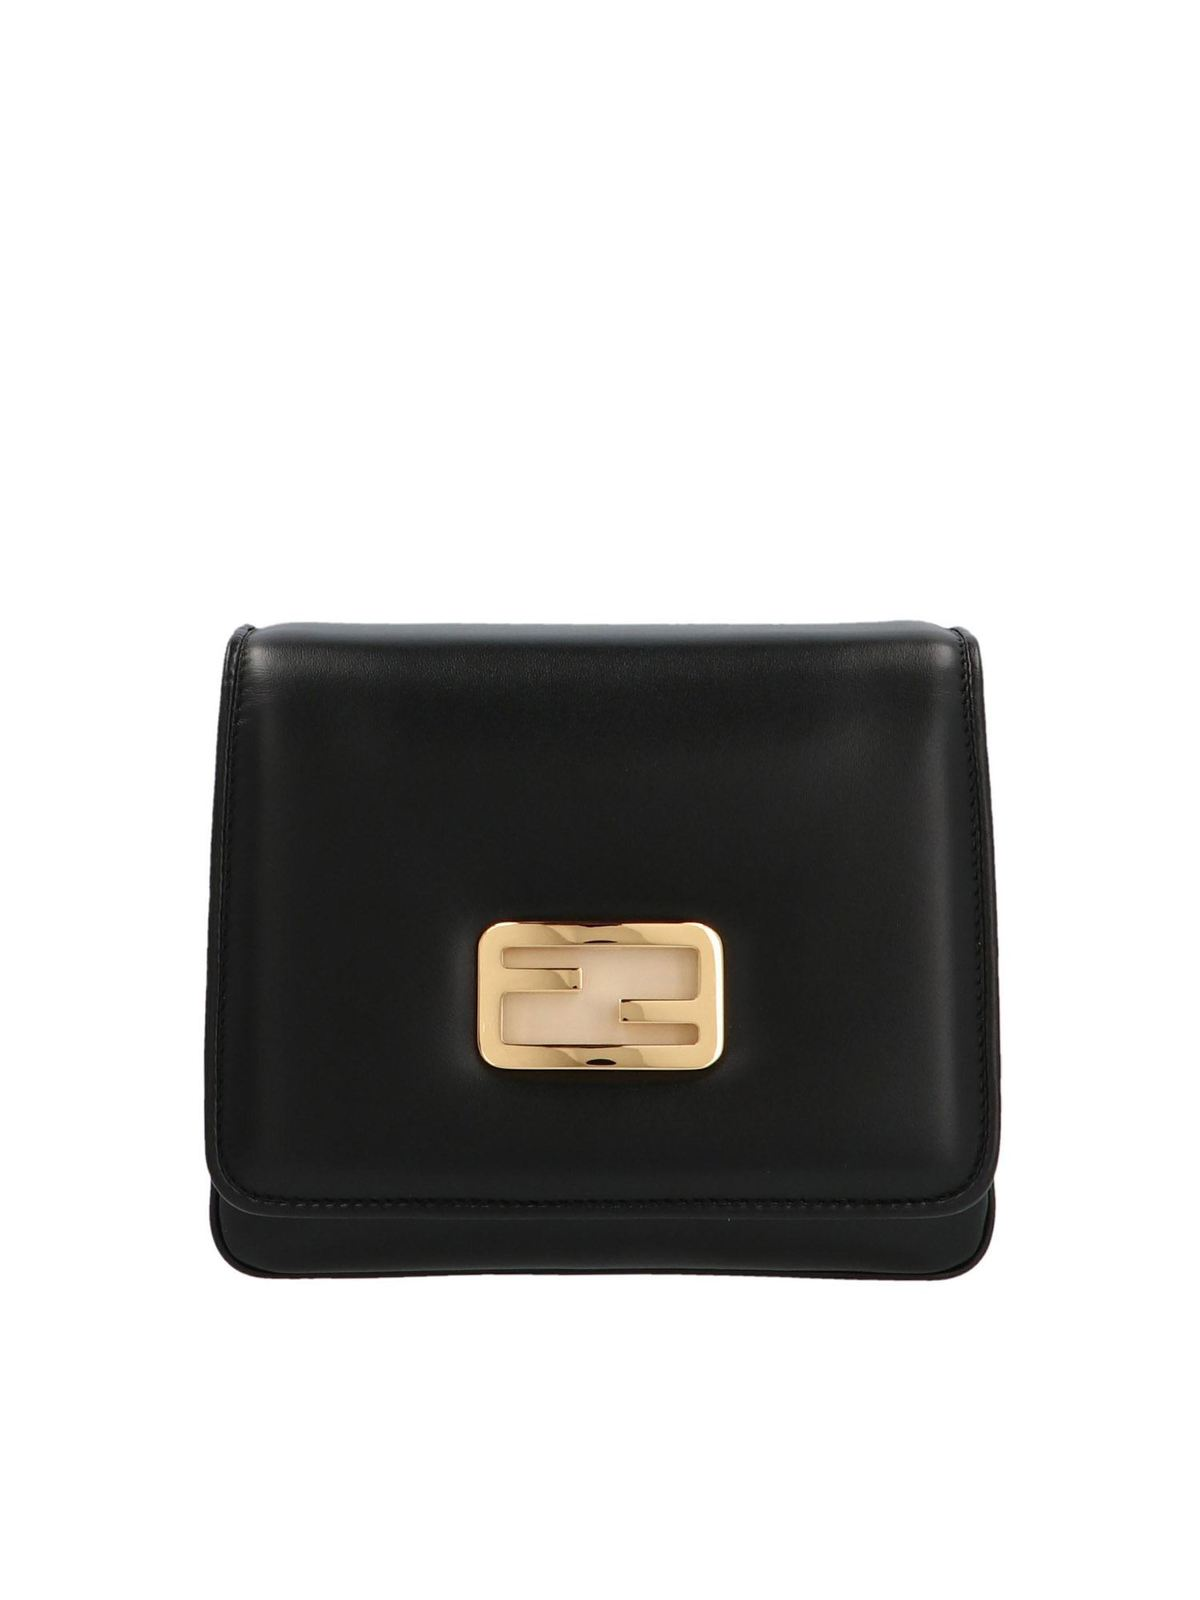 Fendi ID SMALL CROSSBODY BAG IN BLACK